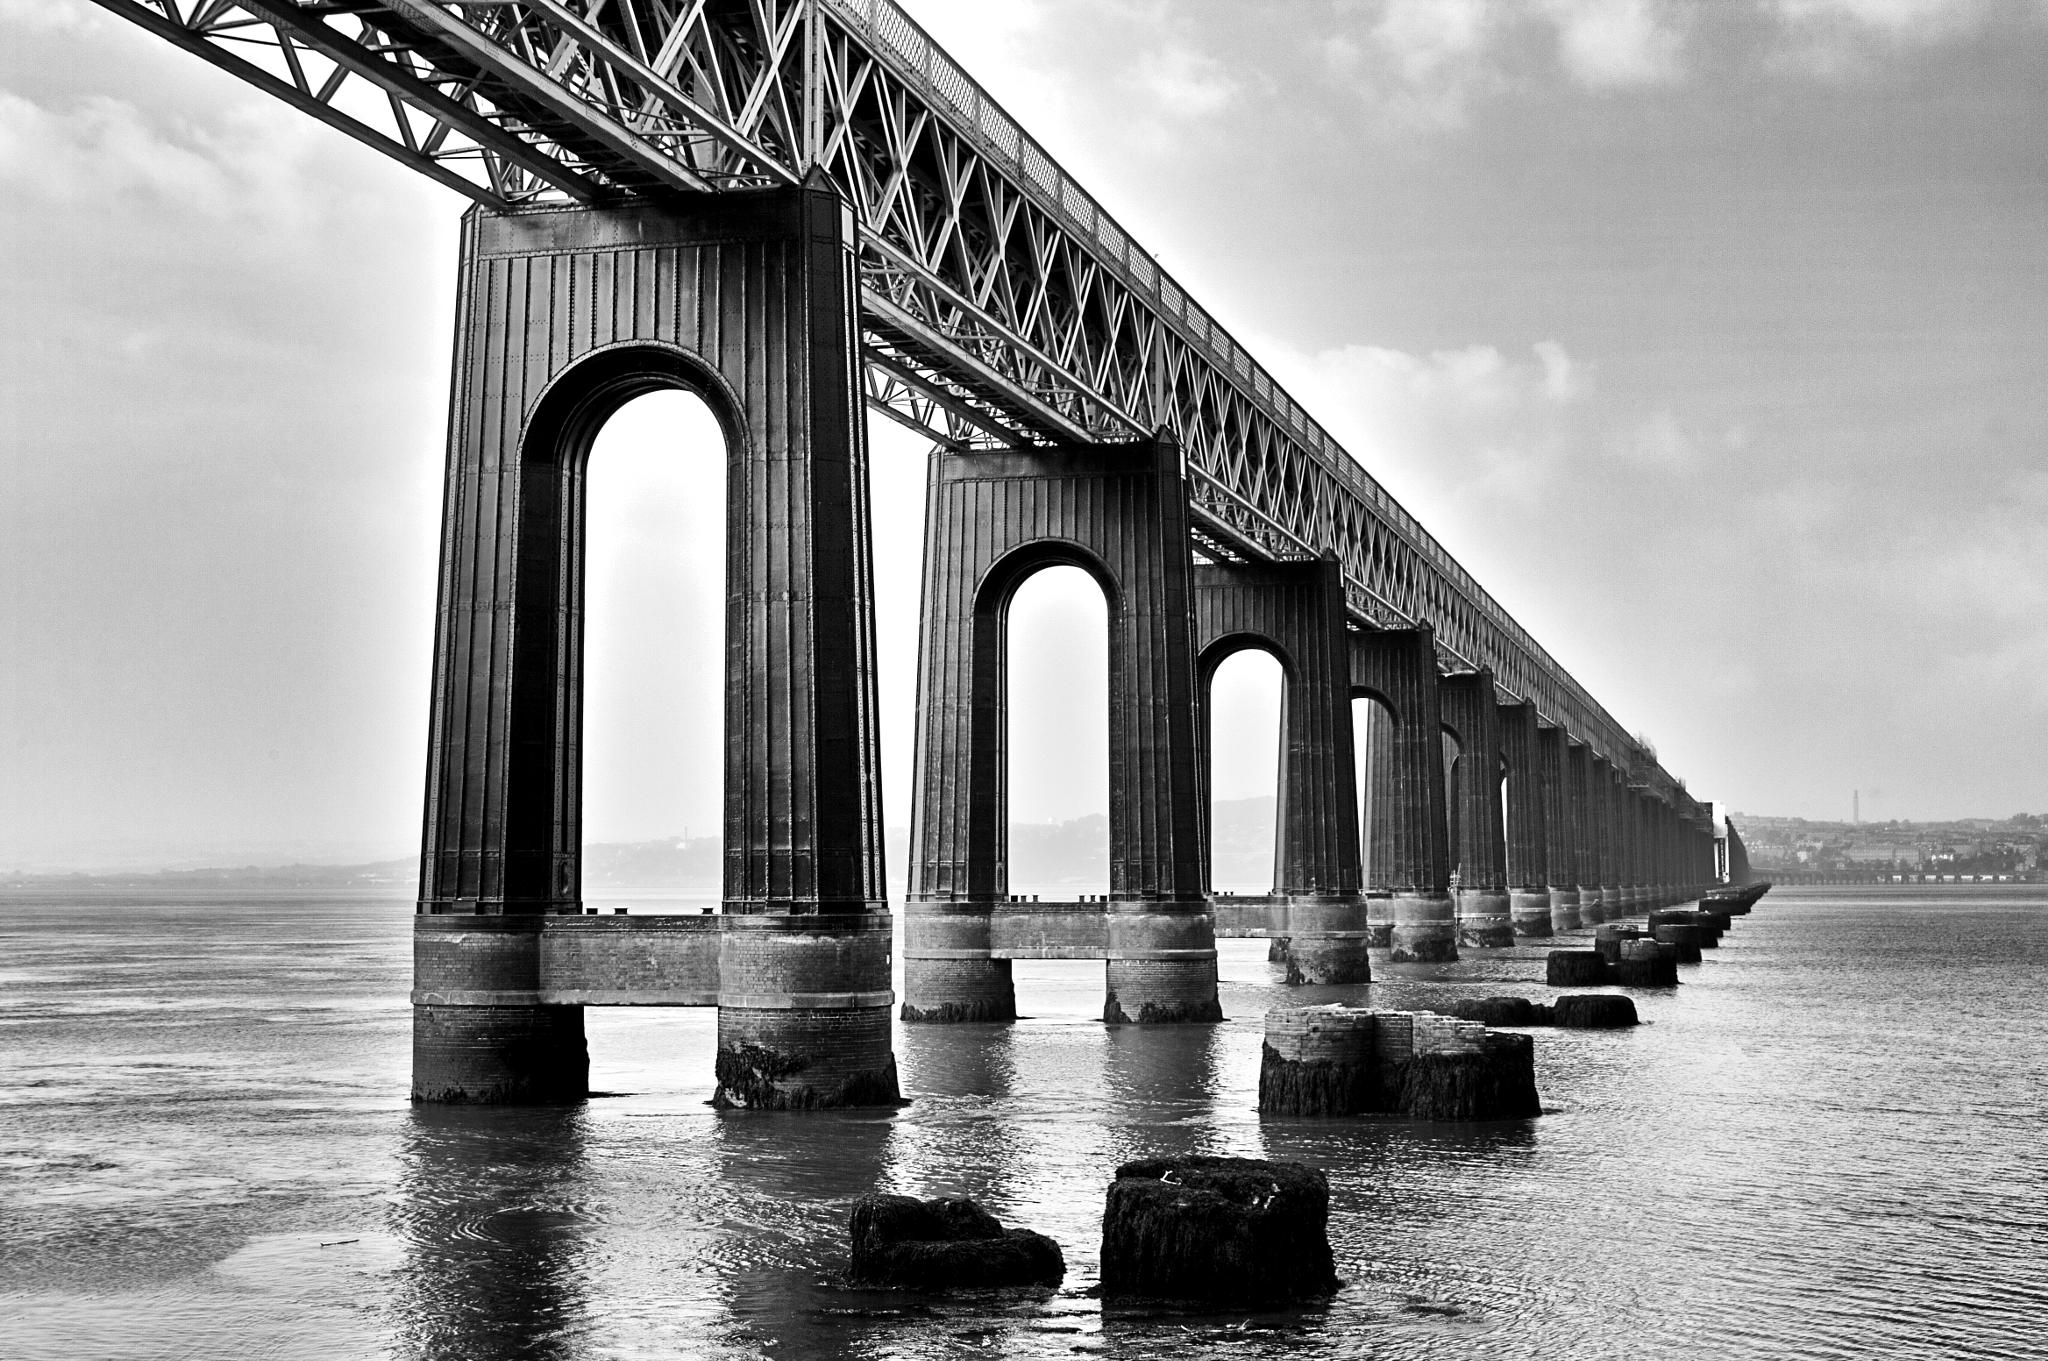 The Bridge by Ian Scrimgeour